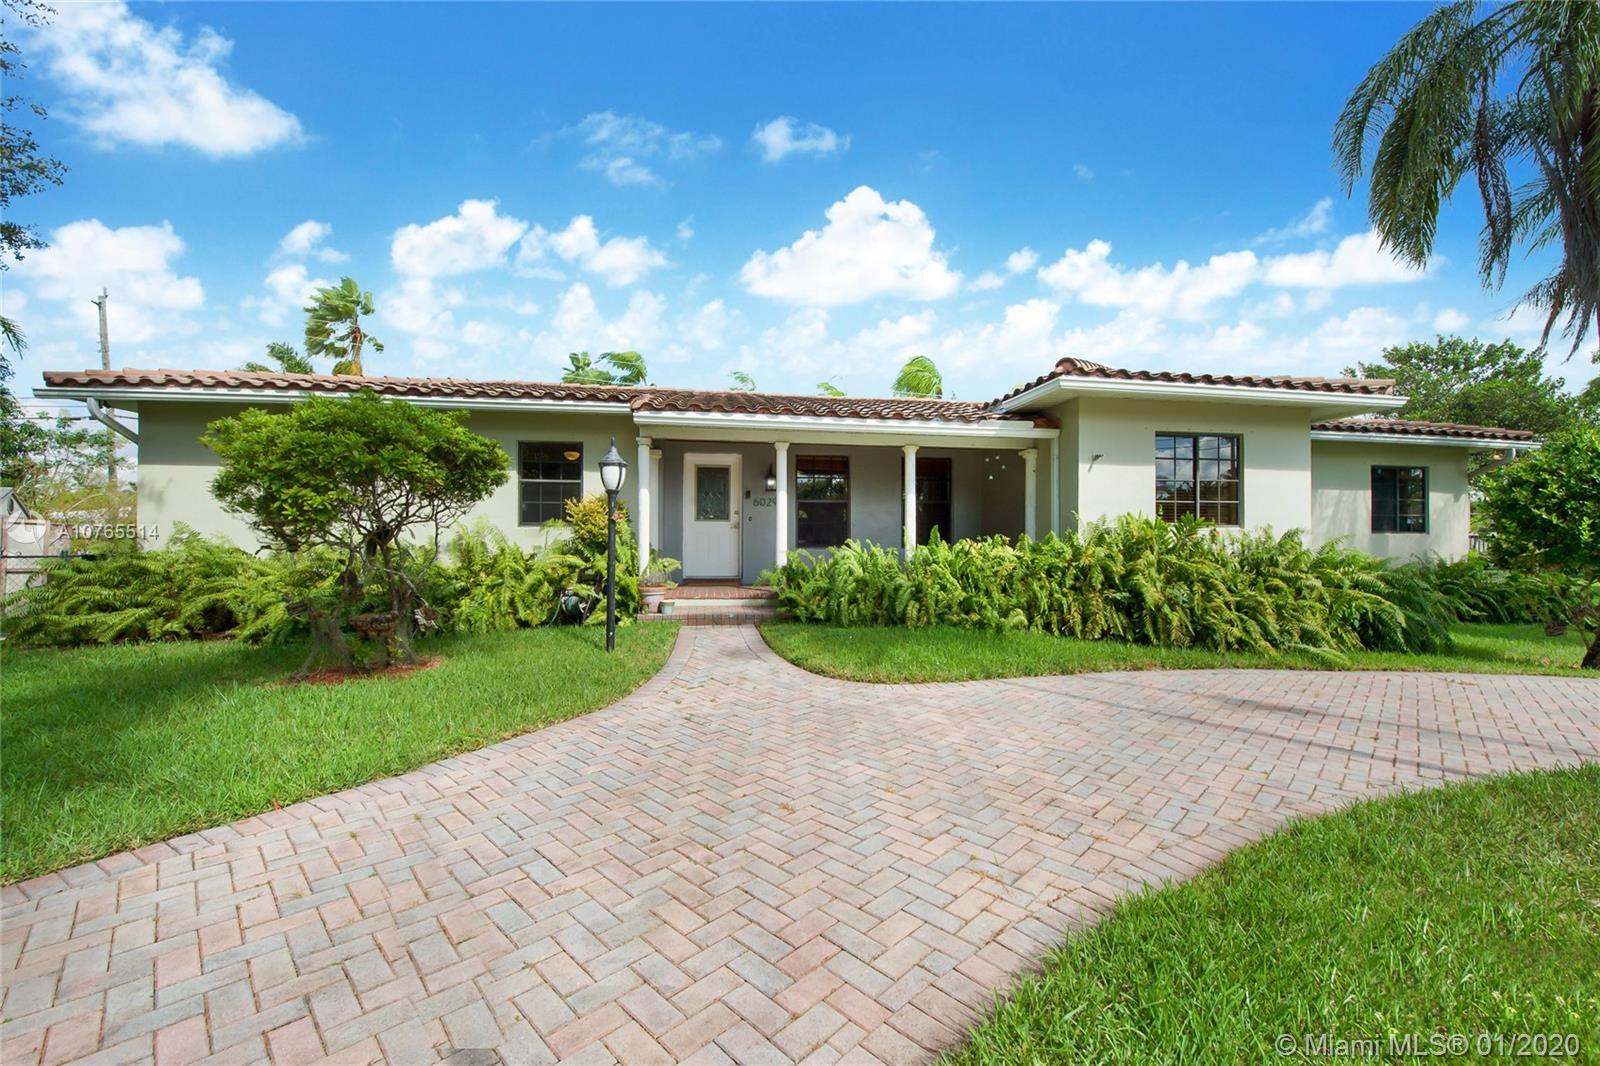 6029 N Waterway Dr, Miami FL 33155